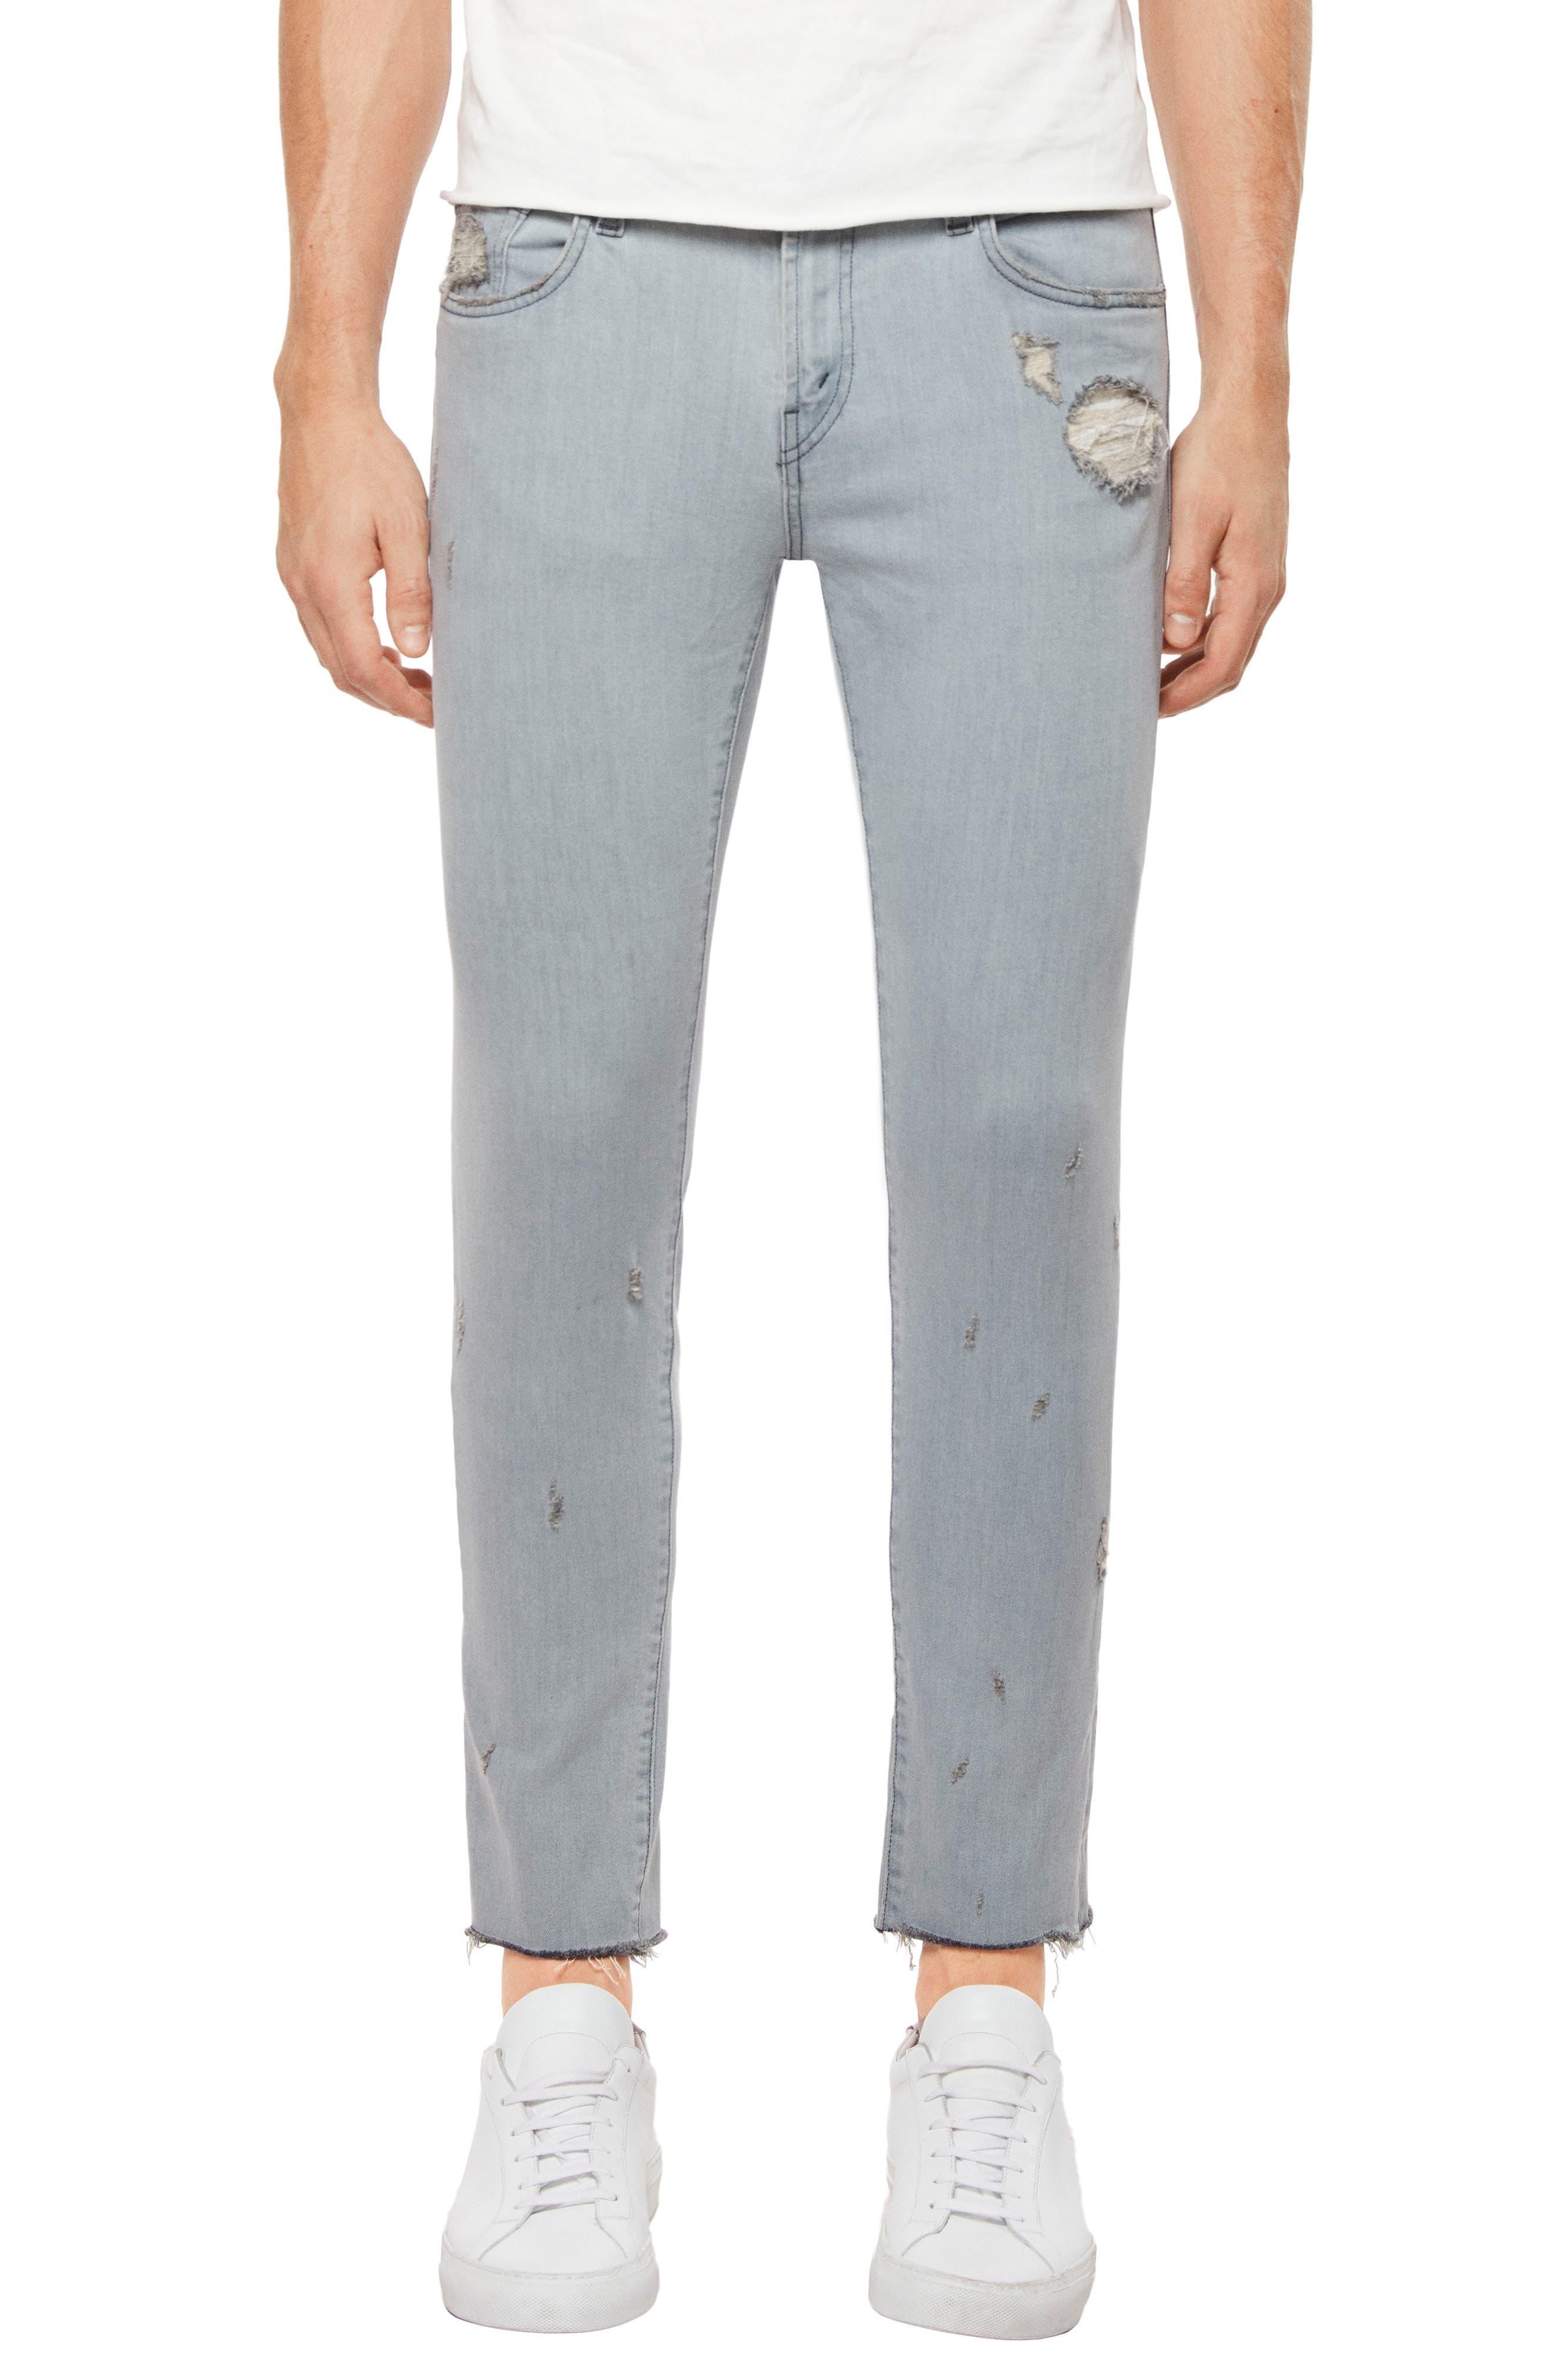 Tyler Slim Fit Jeans,                         Main,                         color, Trounced Porpoise